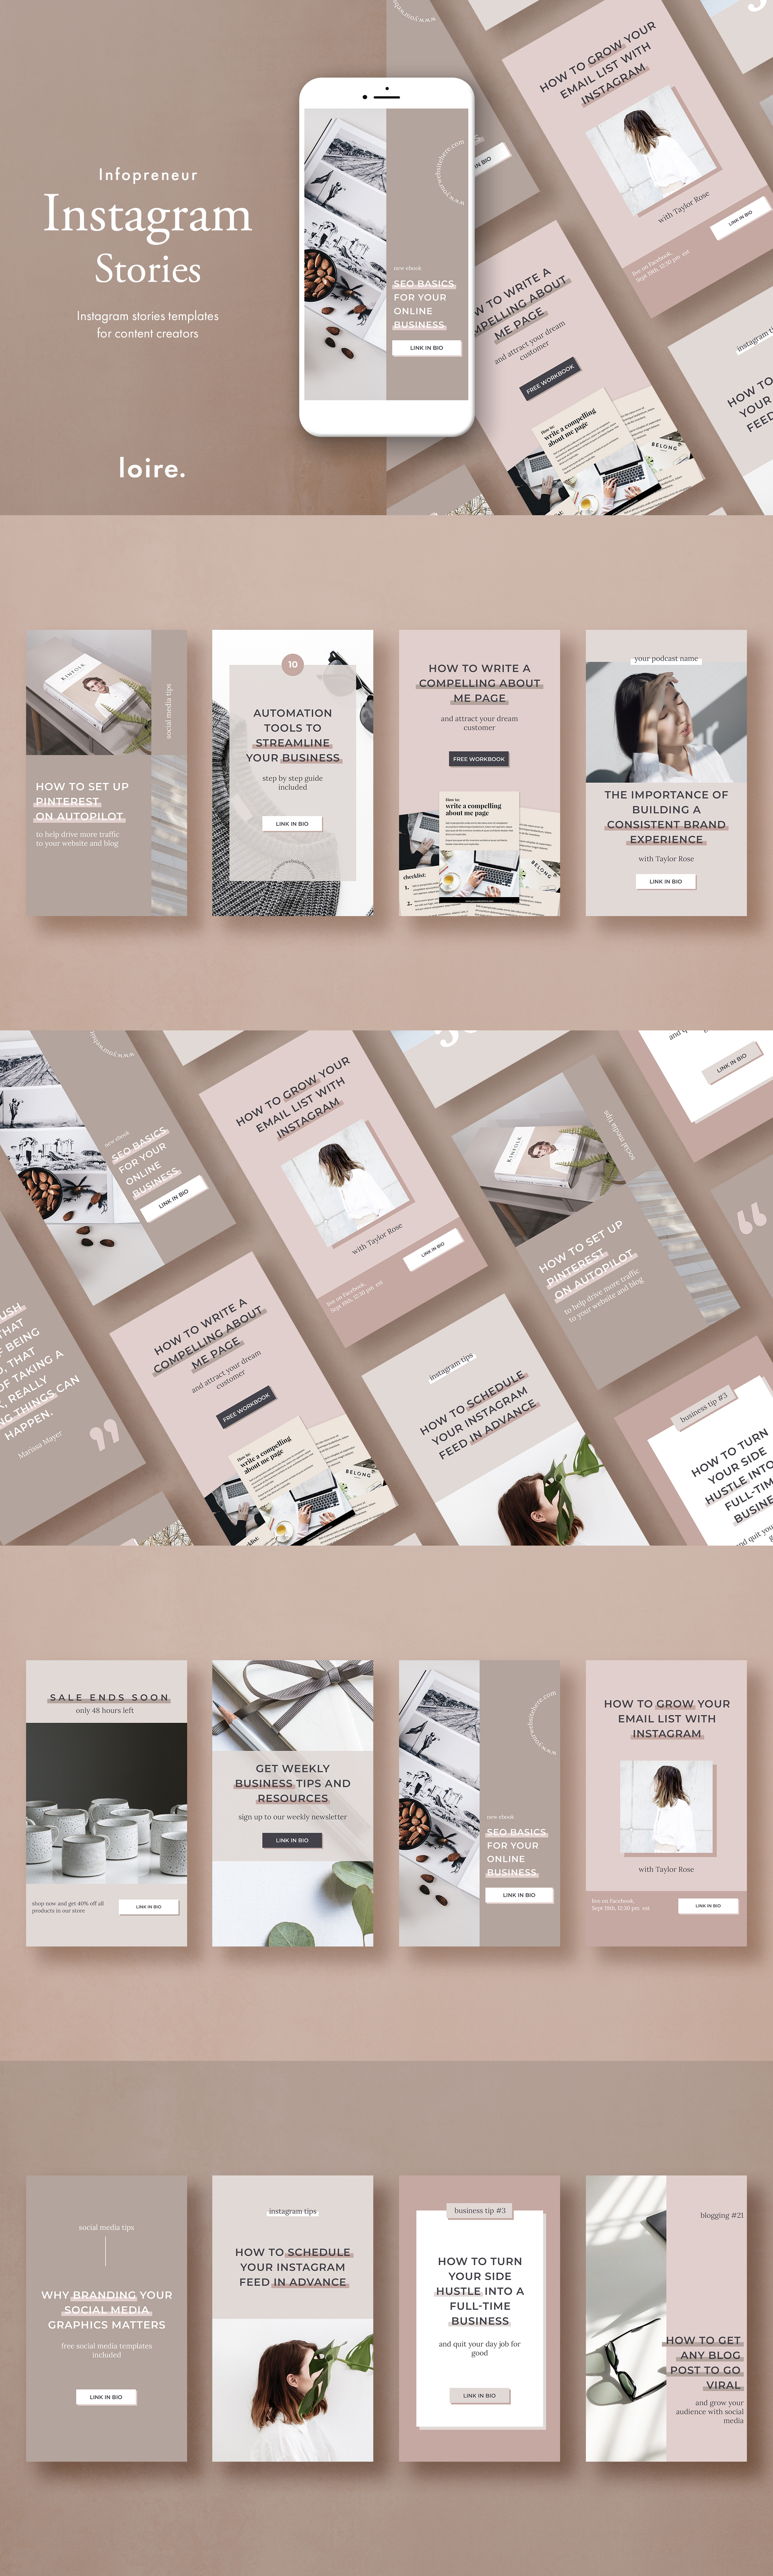 Infopreneur social media marketing bundle for bloggers example image 15